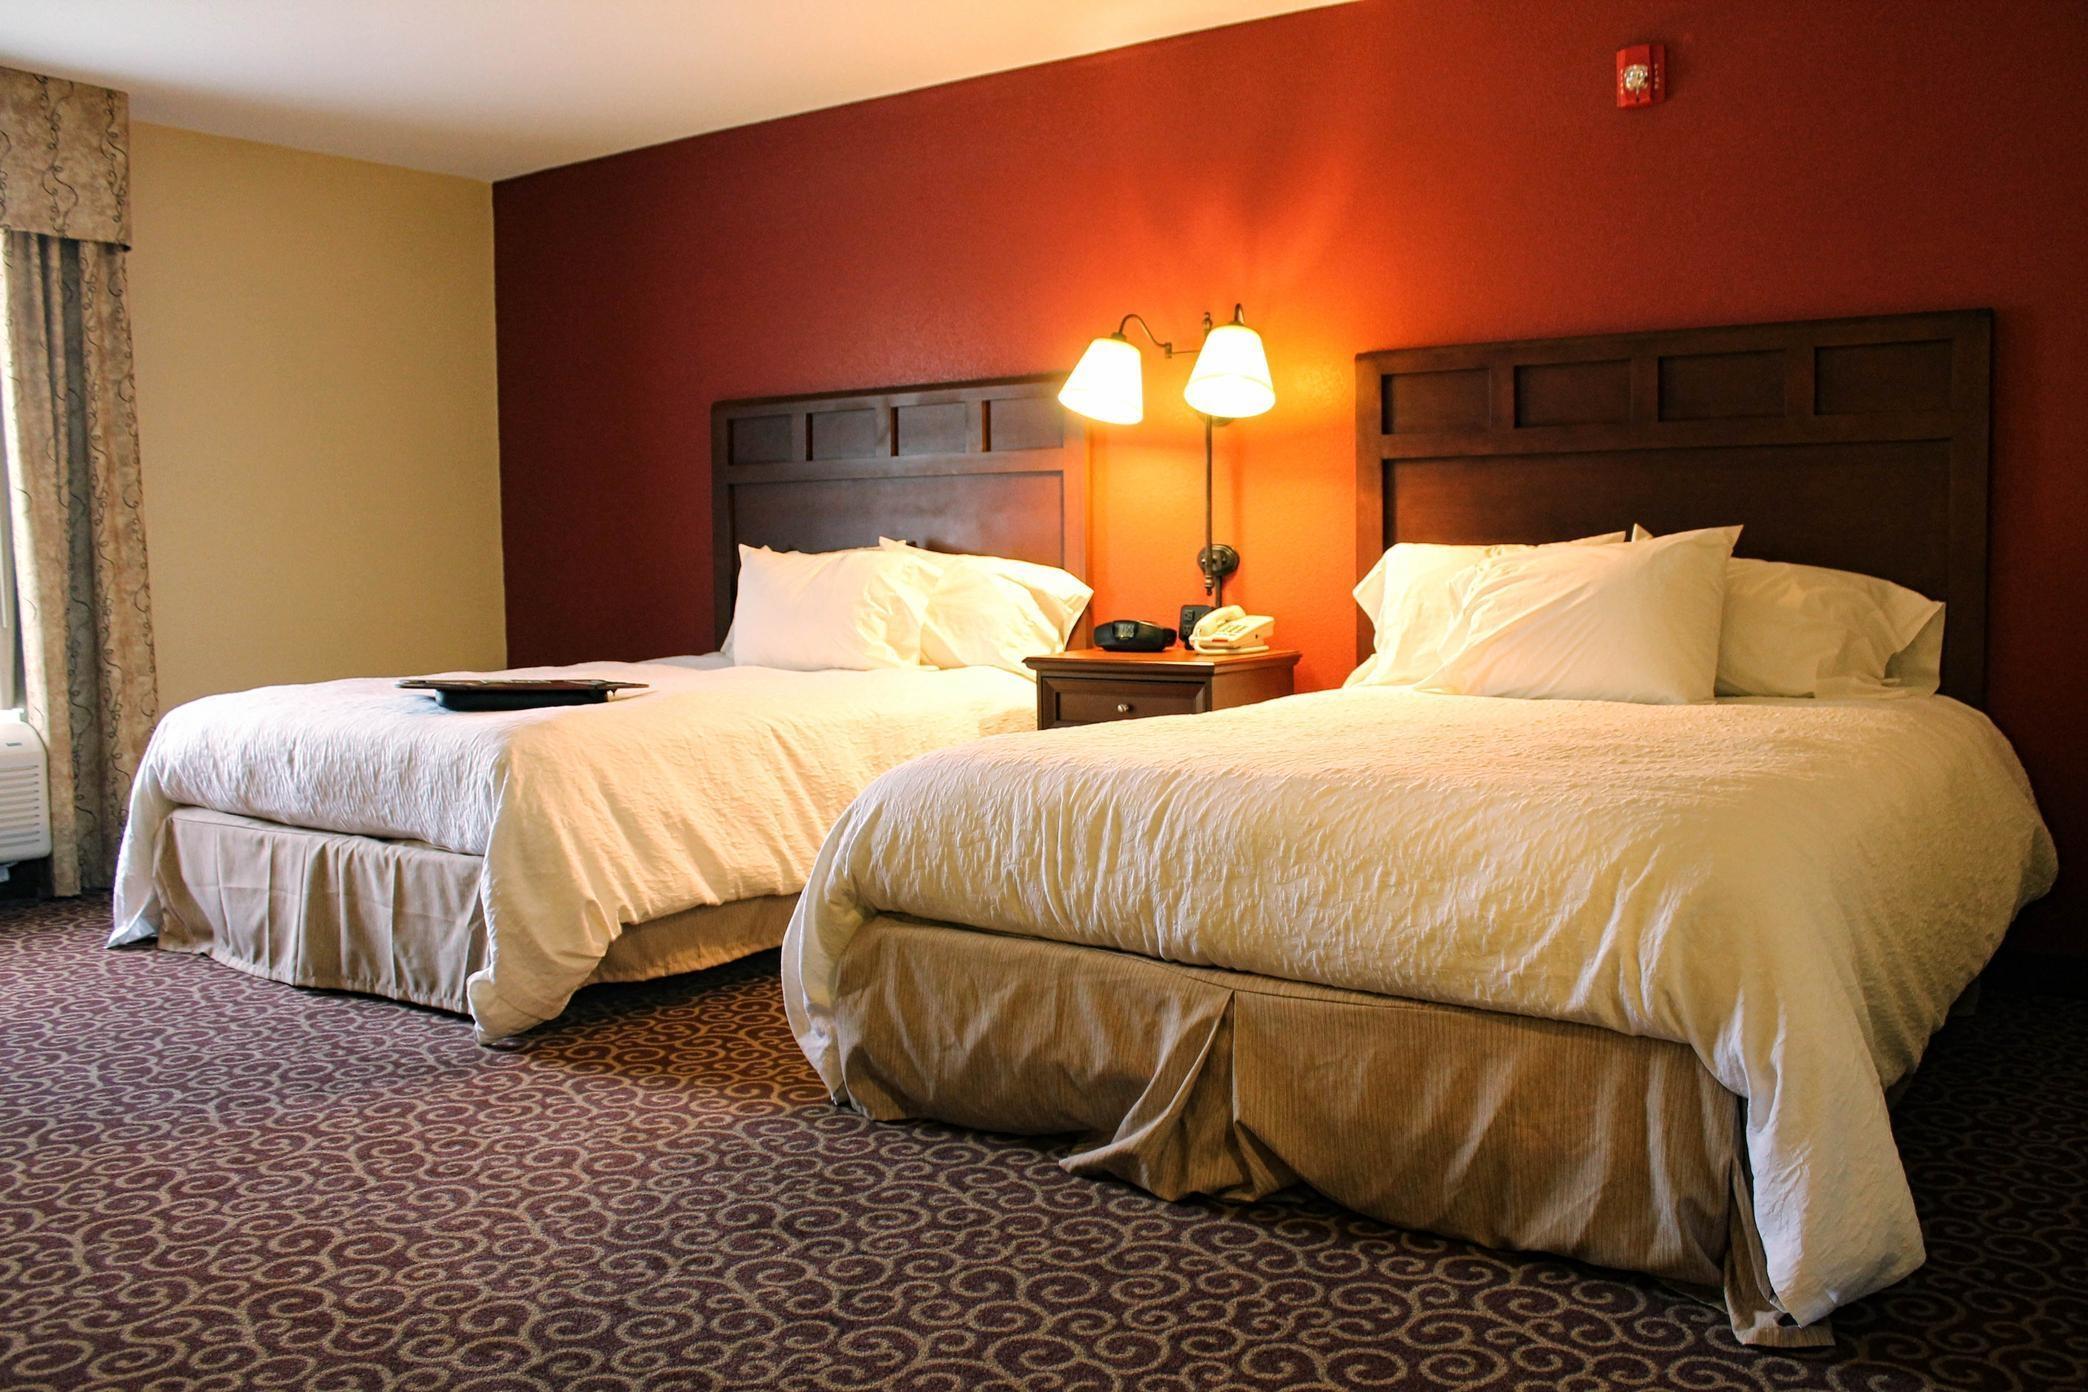 Hampton Inn & Suites Mansfield-South @ I-71 image 5